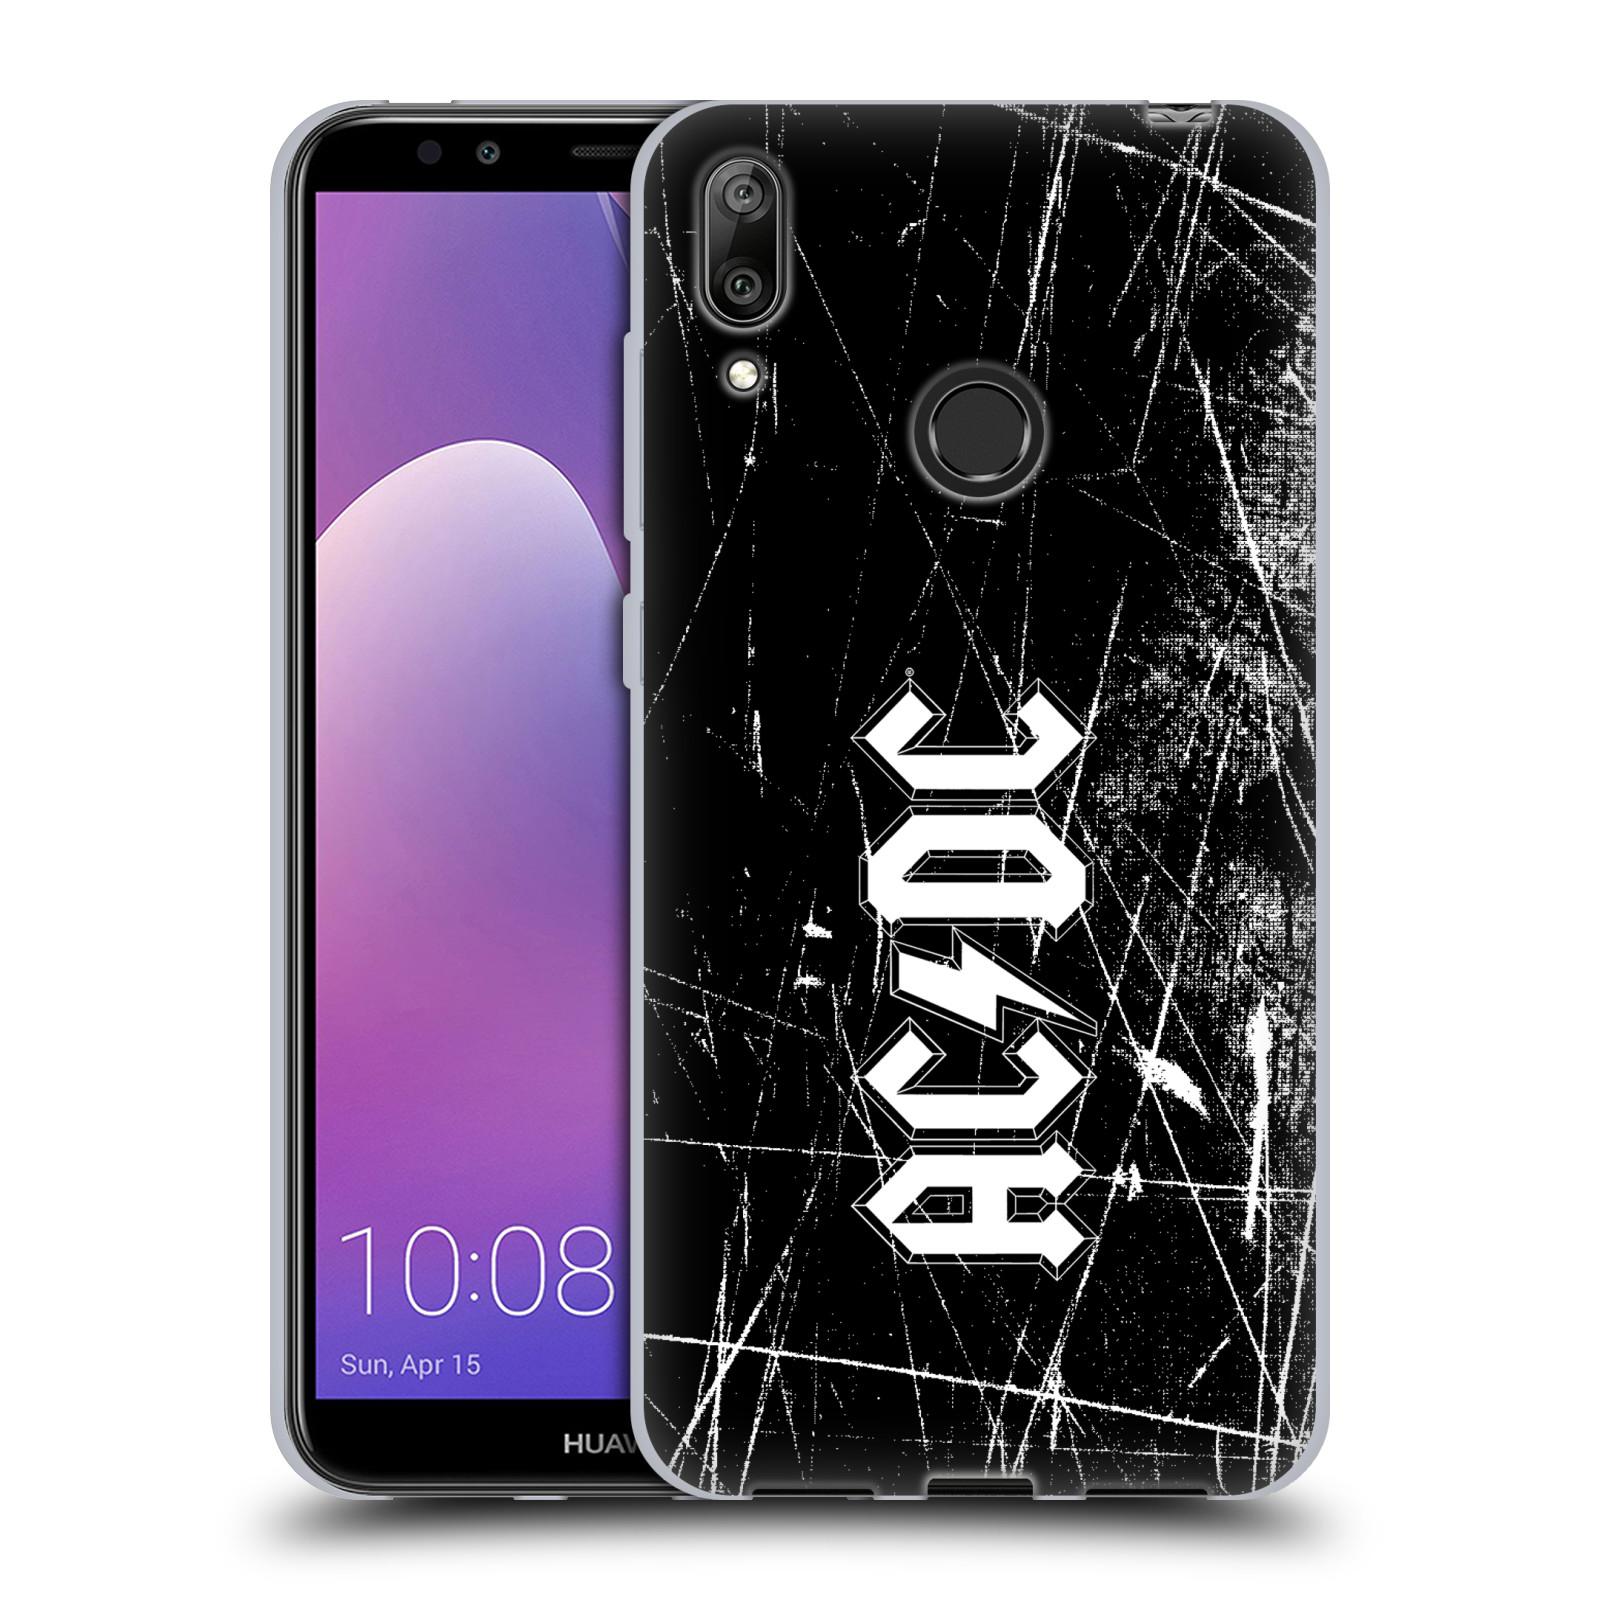 Silikonové pouzdro na mobil Huawei Y7 (2019) - Head Case - AC/DC Černobílé logo